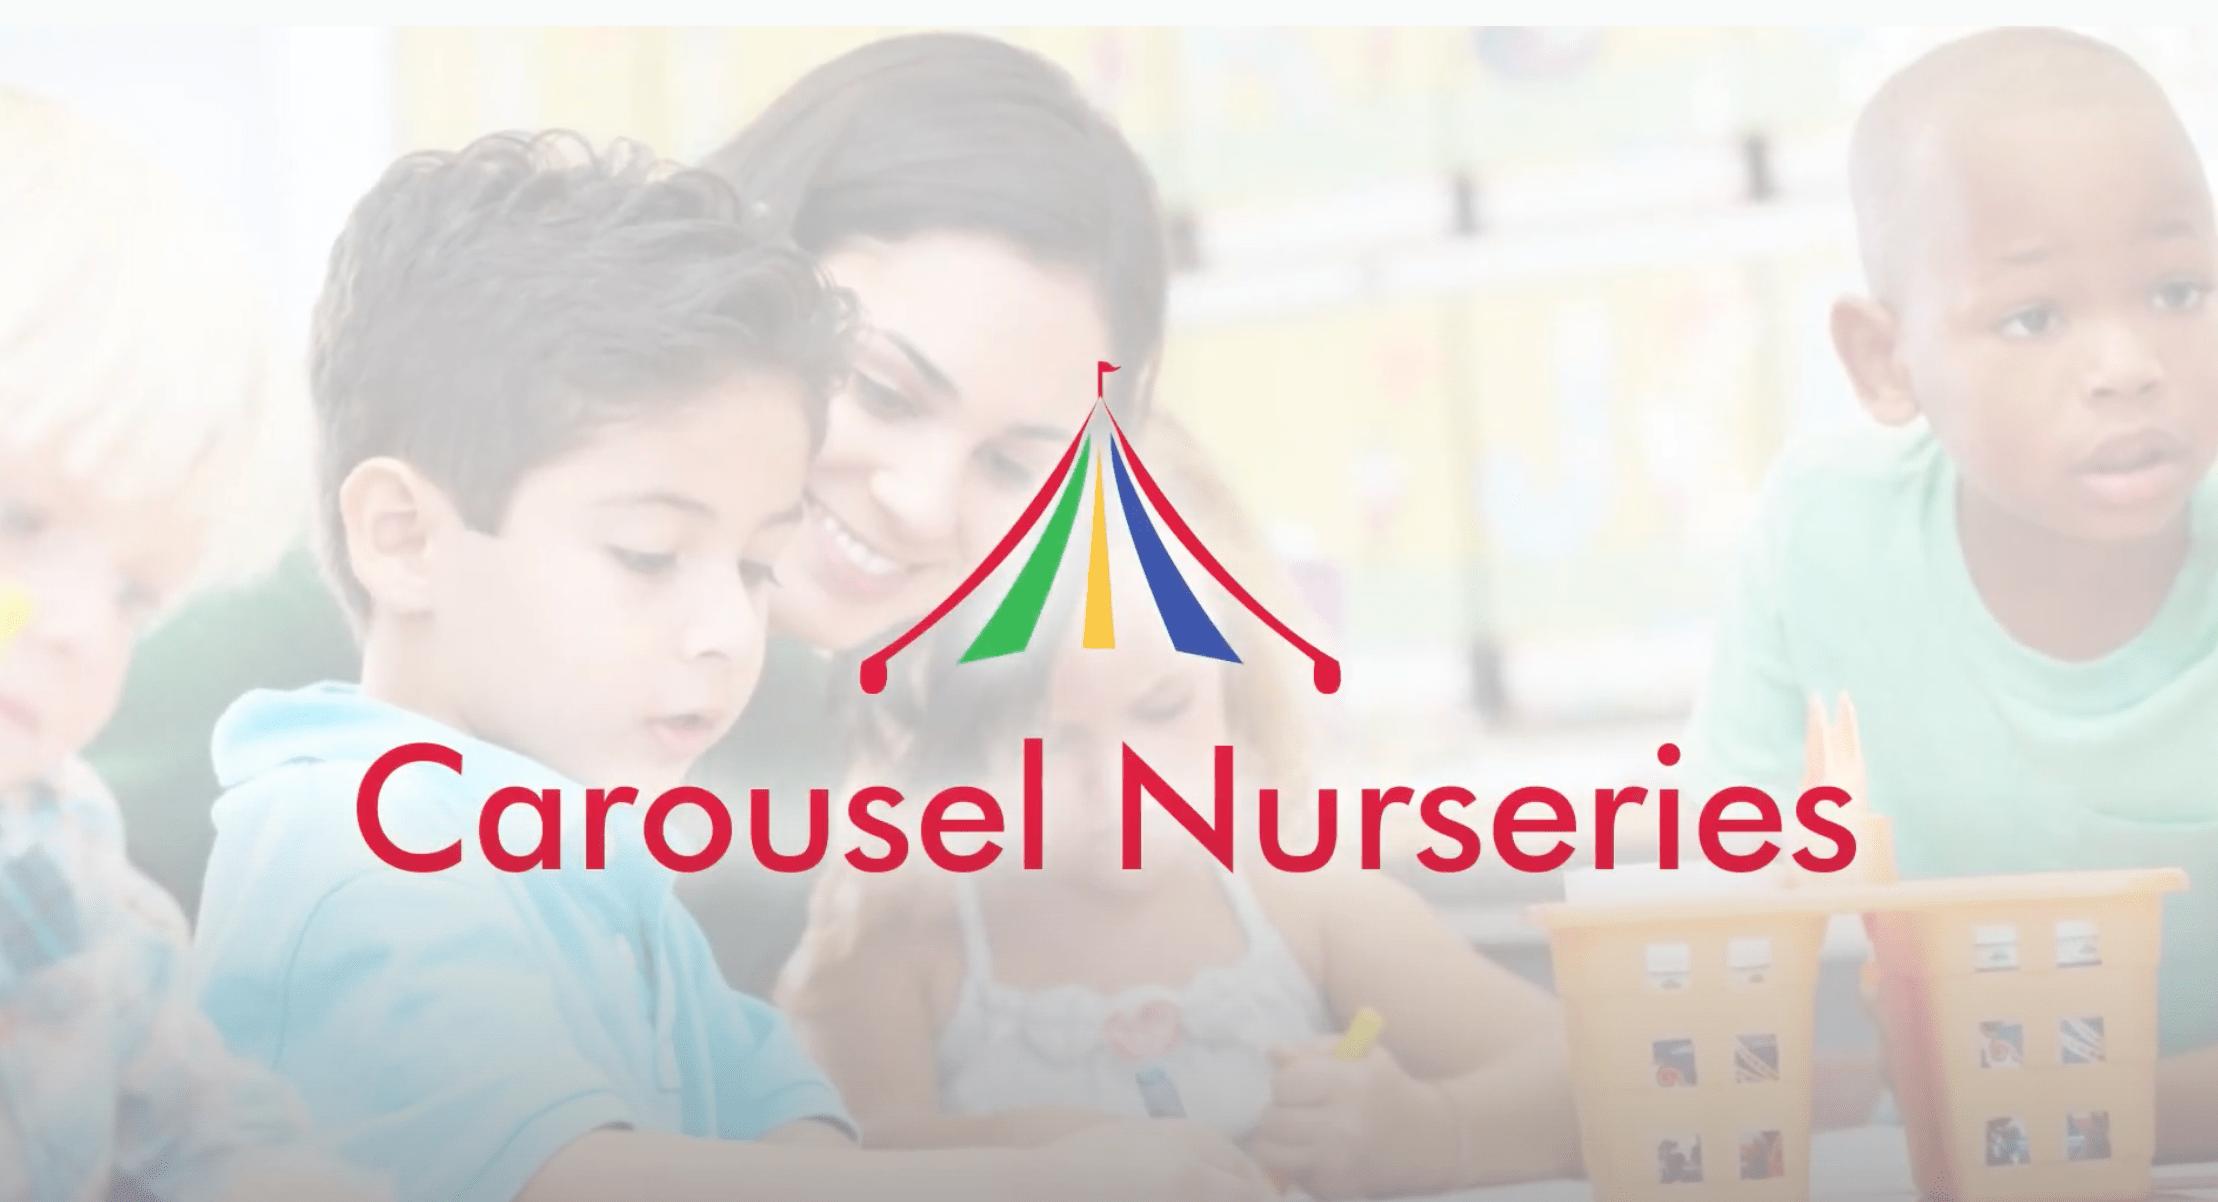 Carousel Nurseries